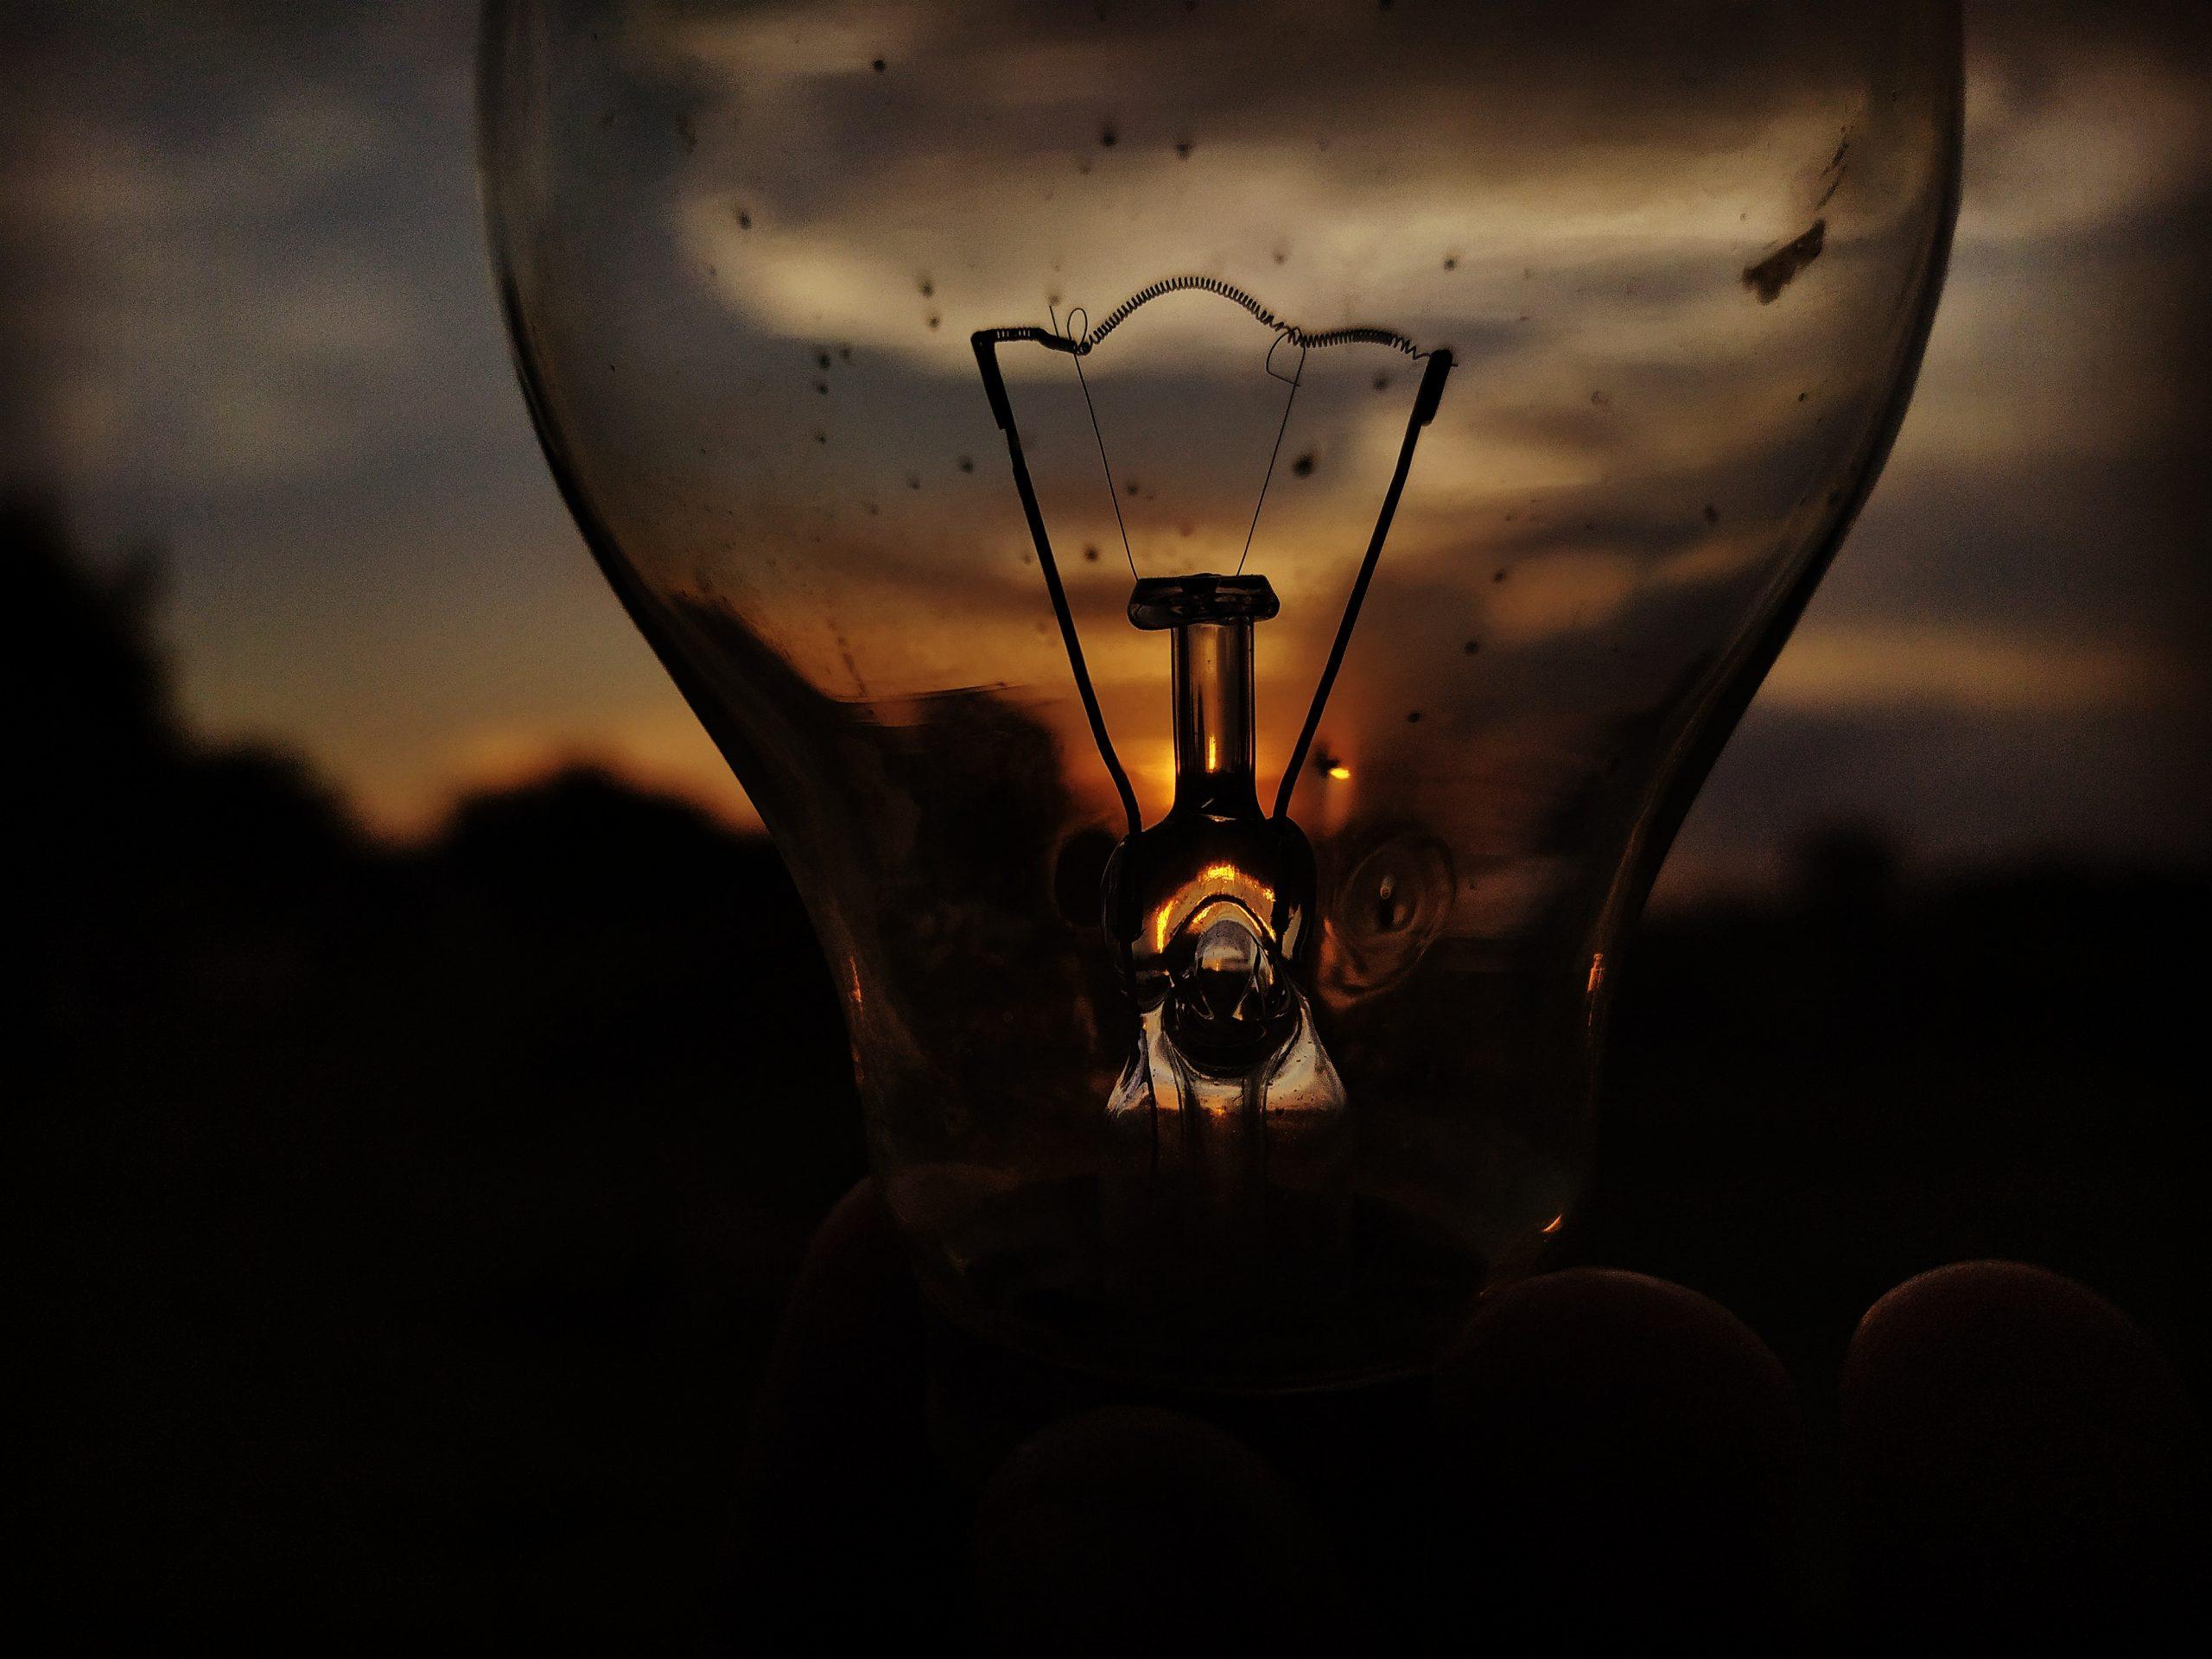 The glowing bulb